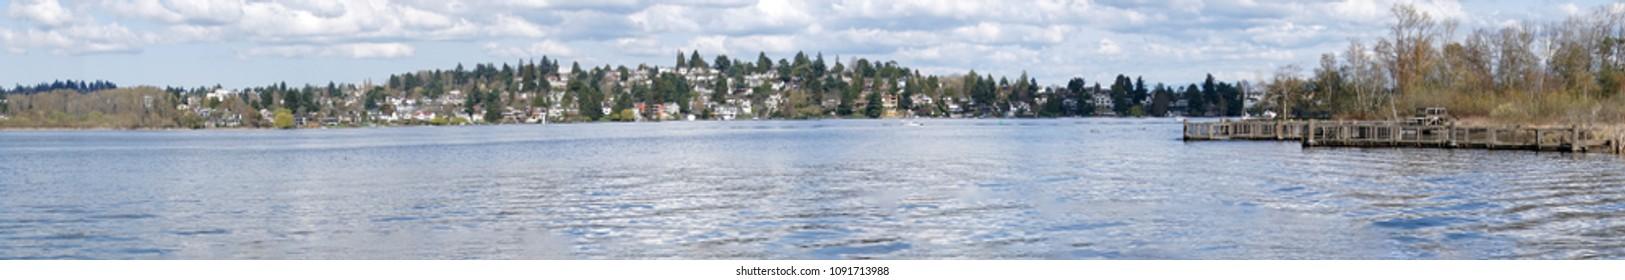 Spring panorama of Laurelhurst residential area and wetlands on Lake Washington in Seattle